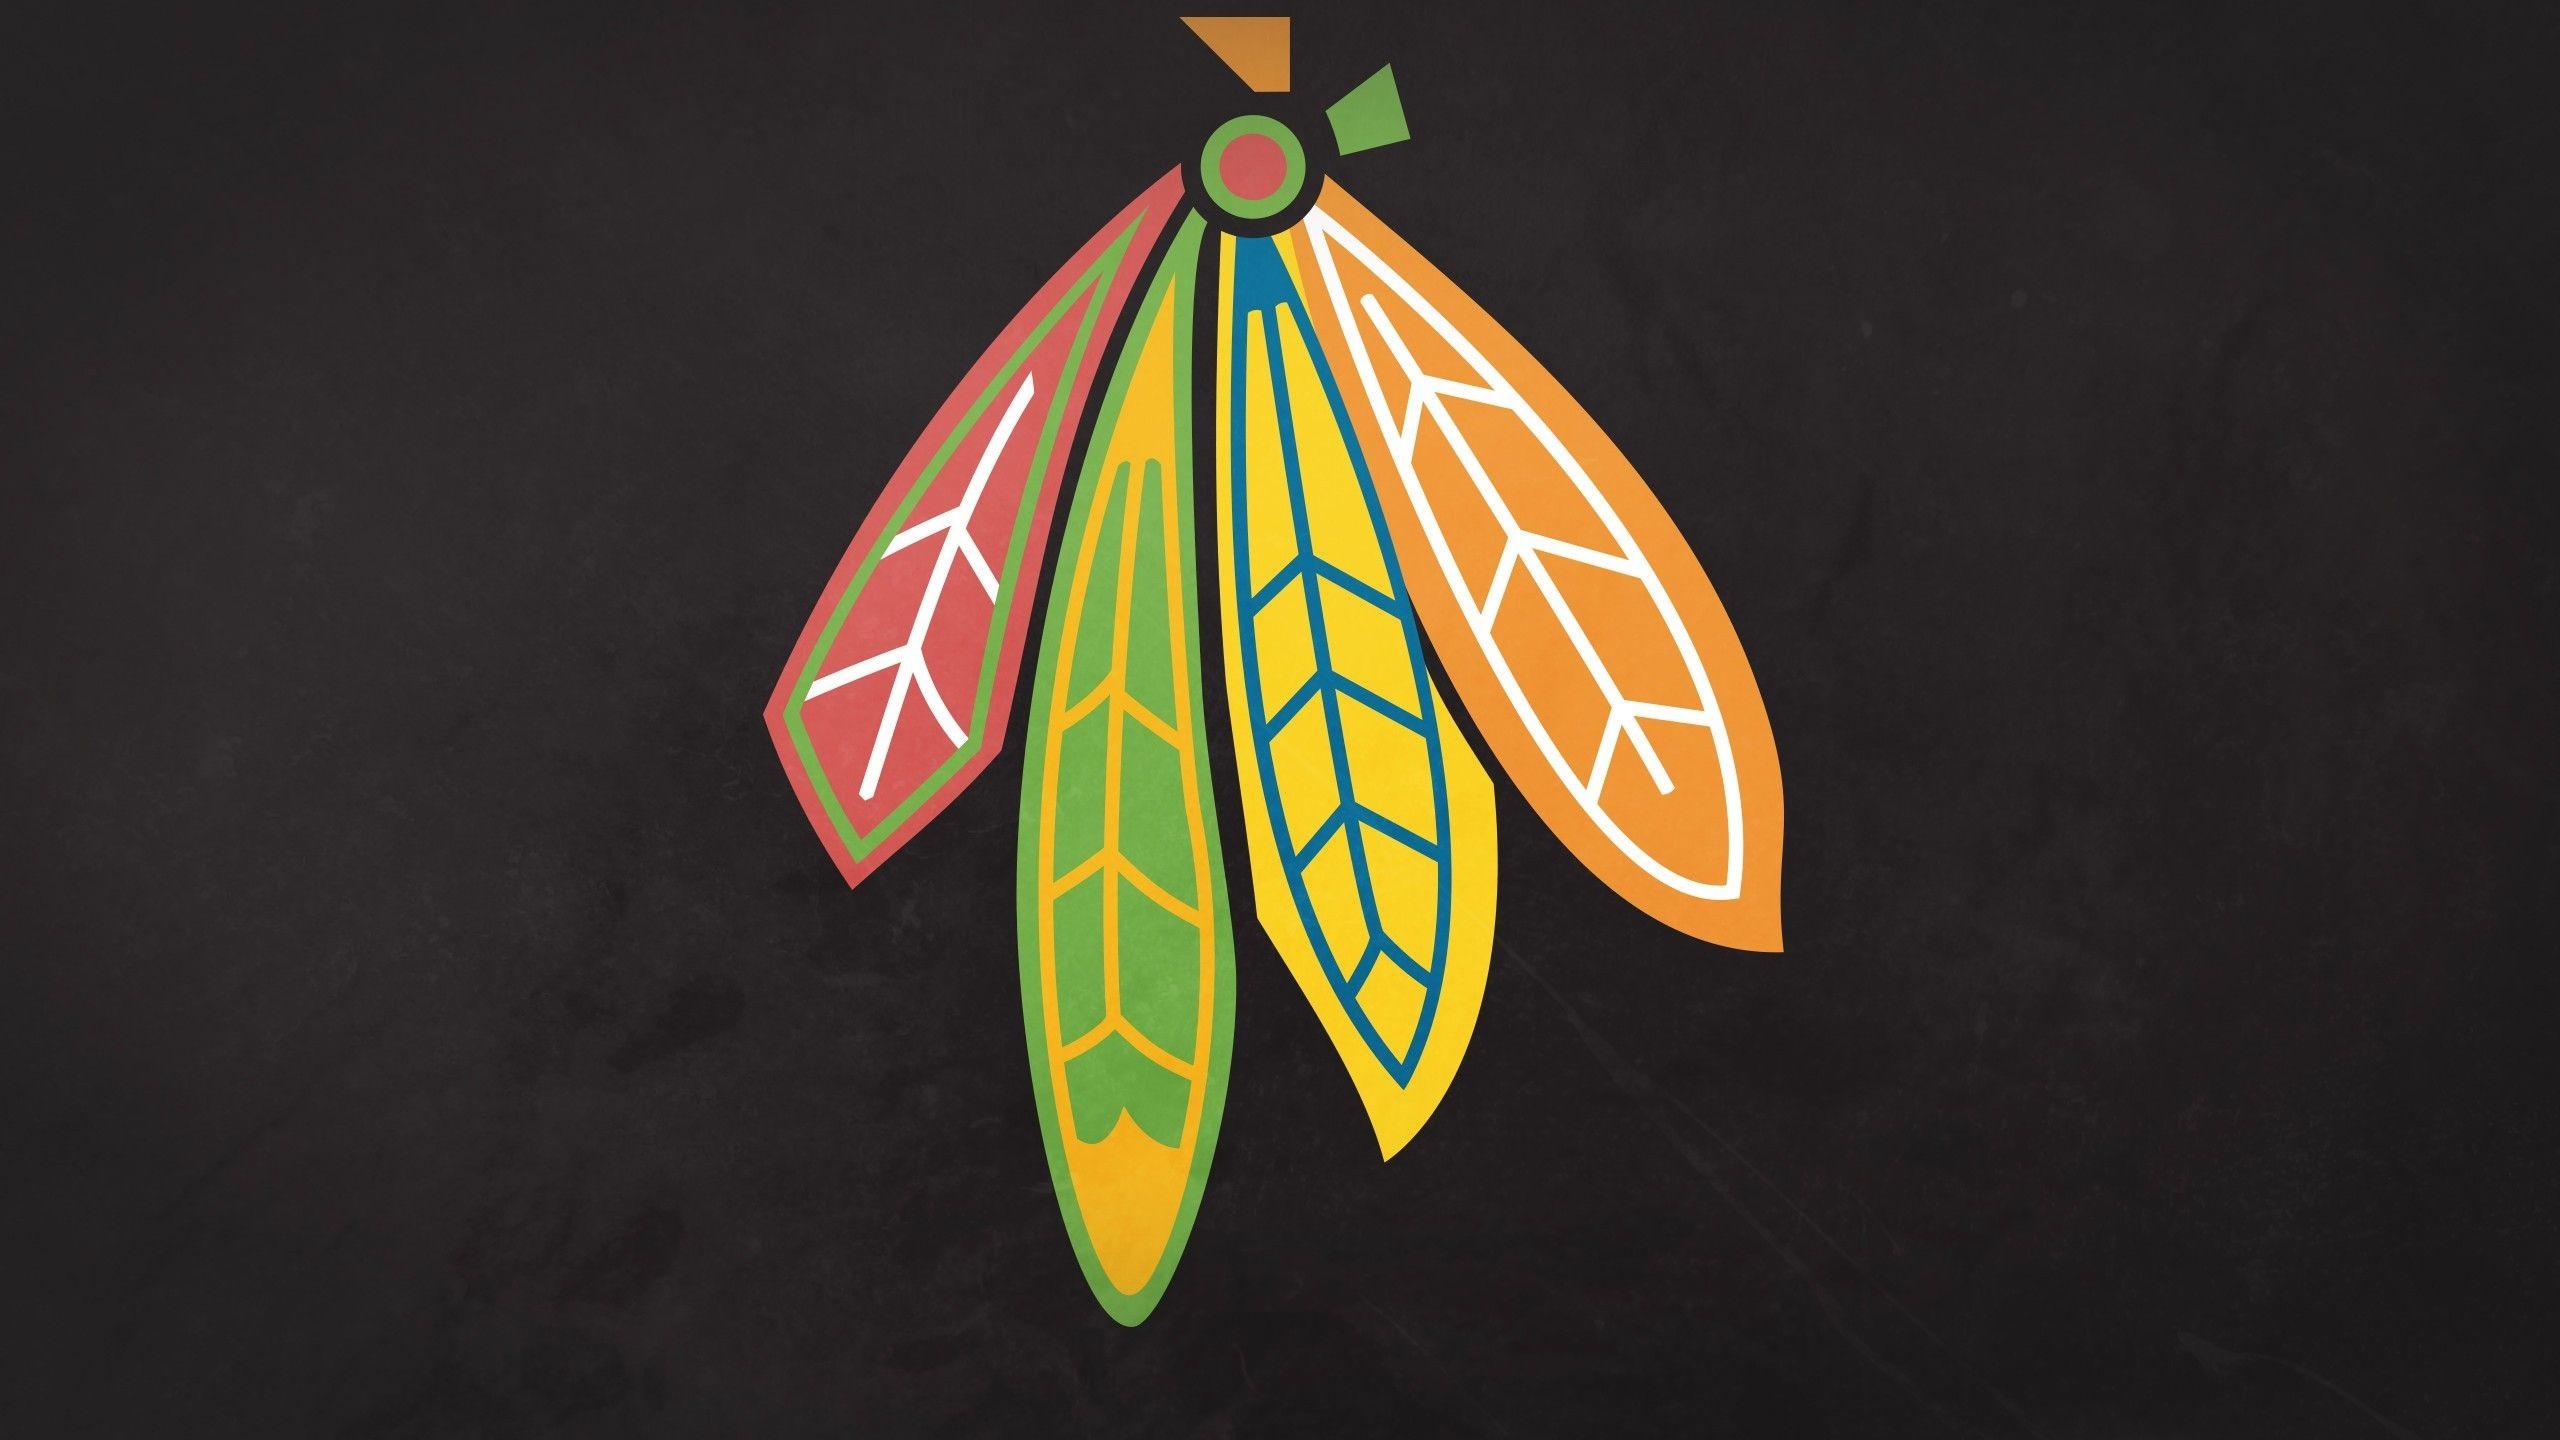 Chicago Blackhawks Wallpaper For Iphone 66 Images